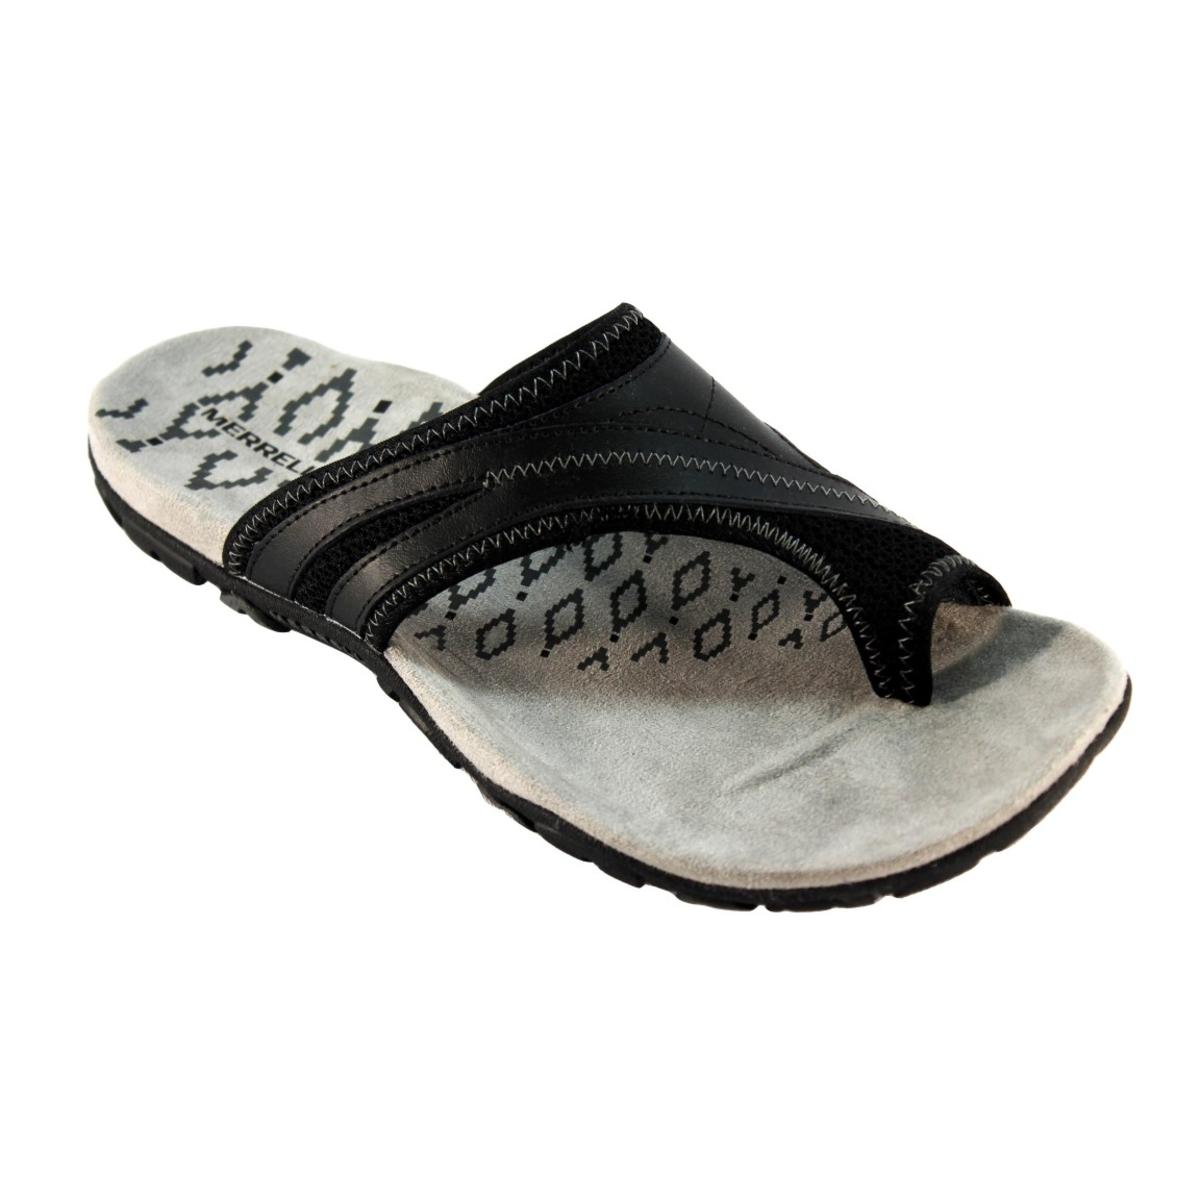 Black merrell sandals - Black Merrell Sandals 26